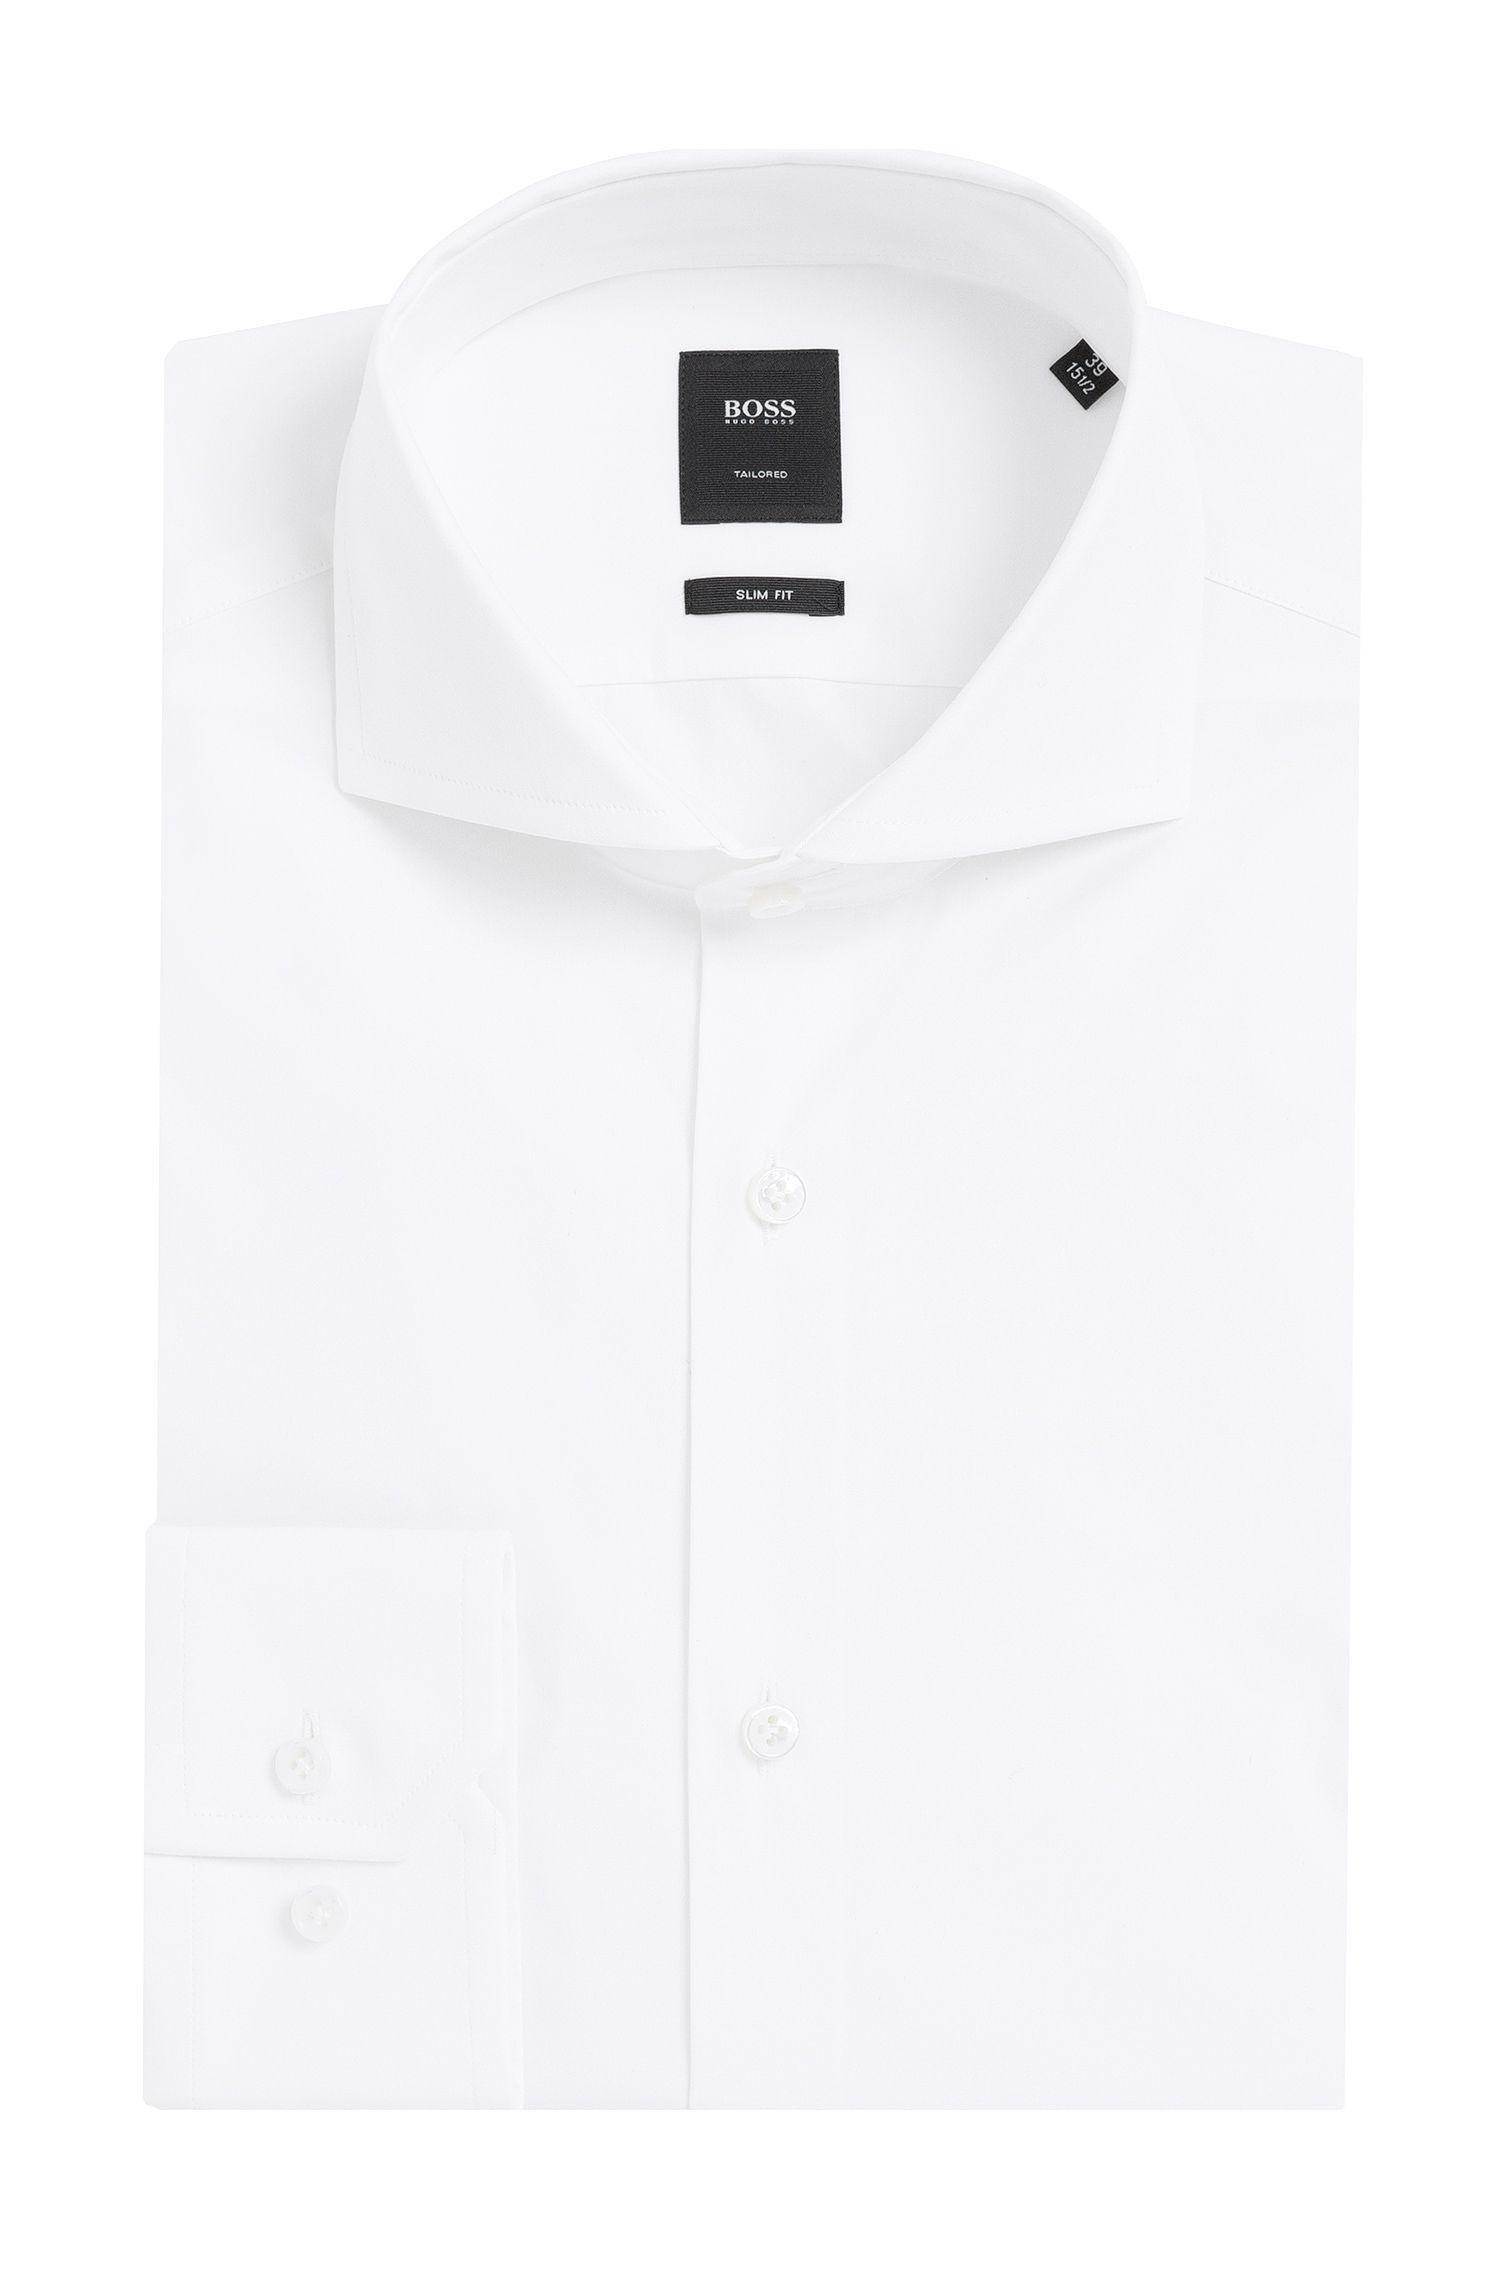 'T-Christo' | Slim Fit, Italian Stretch Cotton Blend Dress Shirt